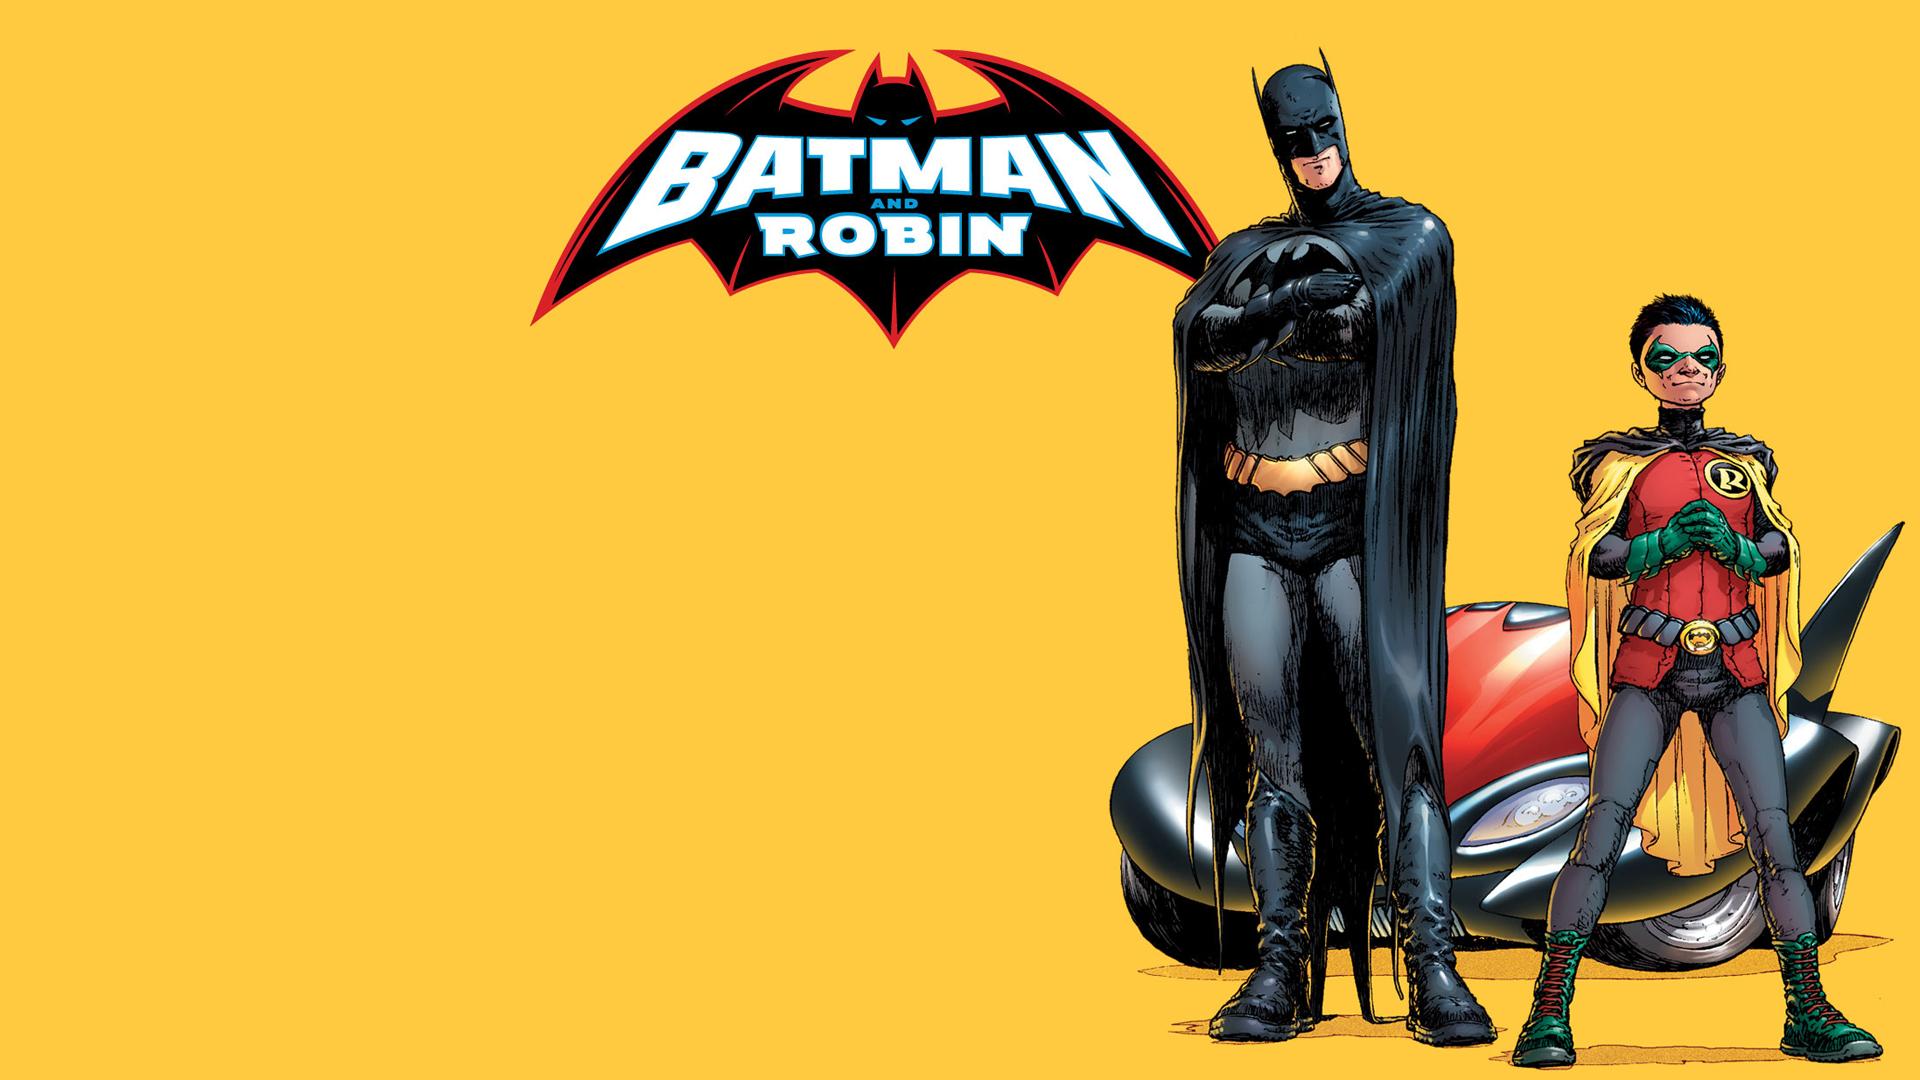 batman robin wallpaper 1433x897 - photo #24